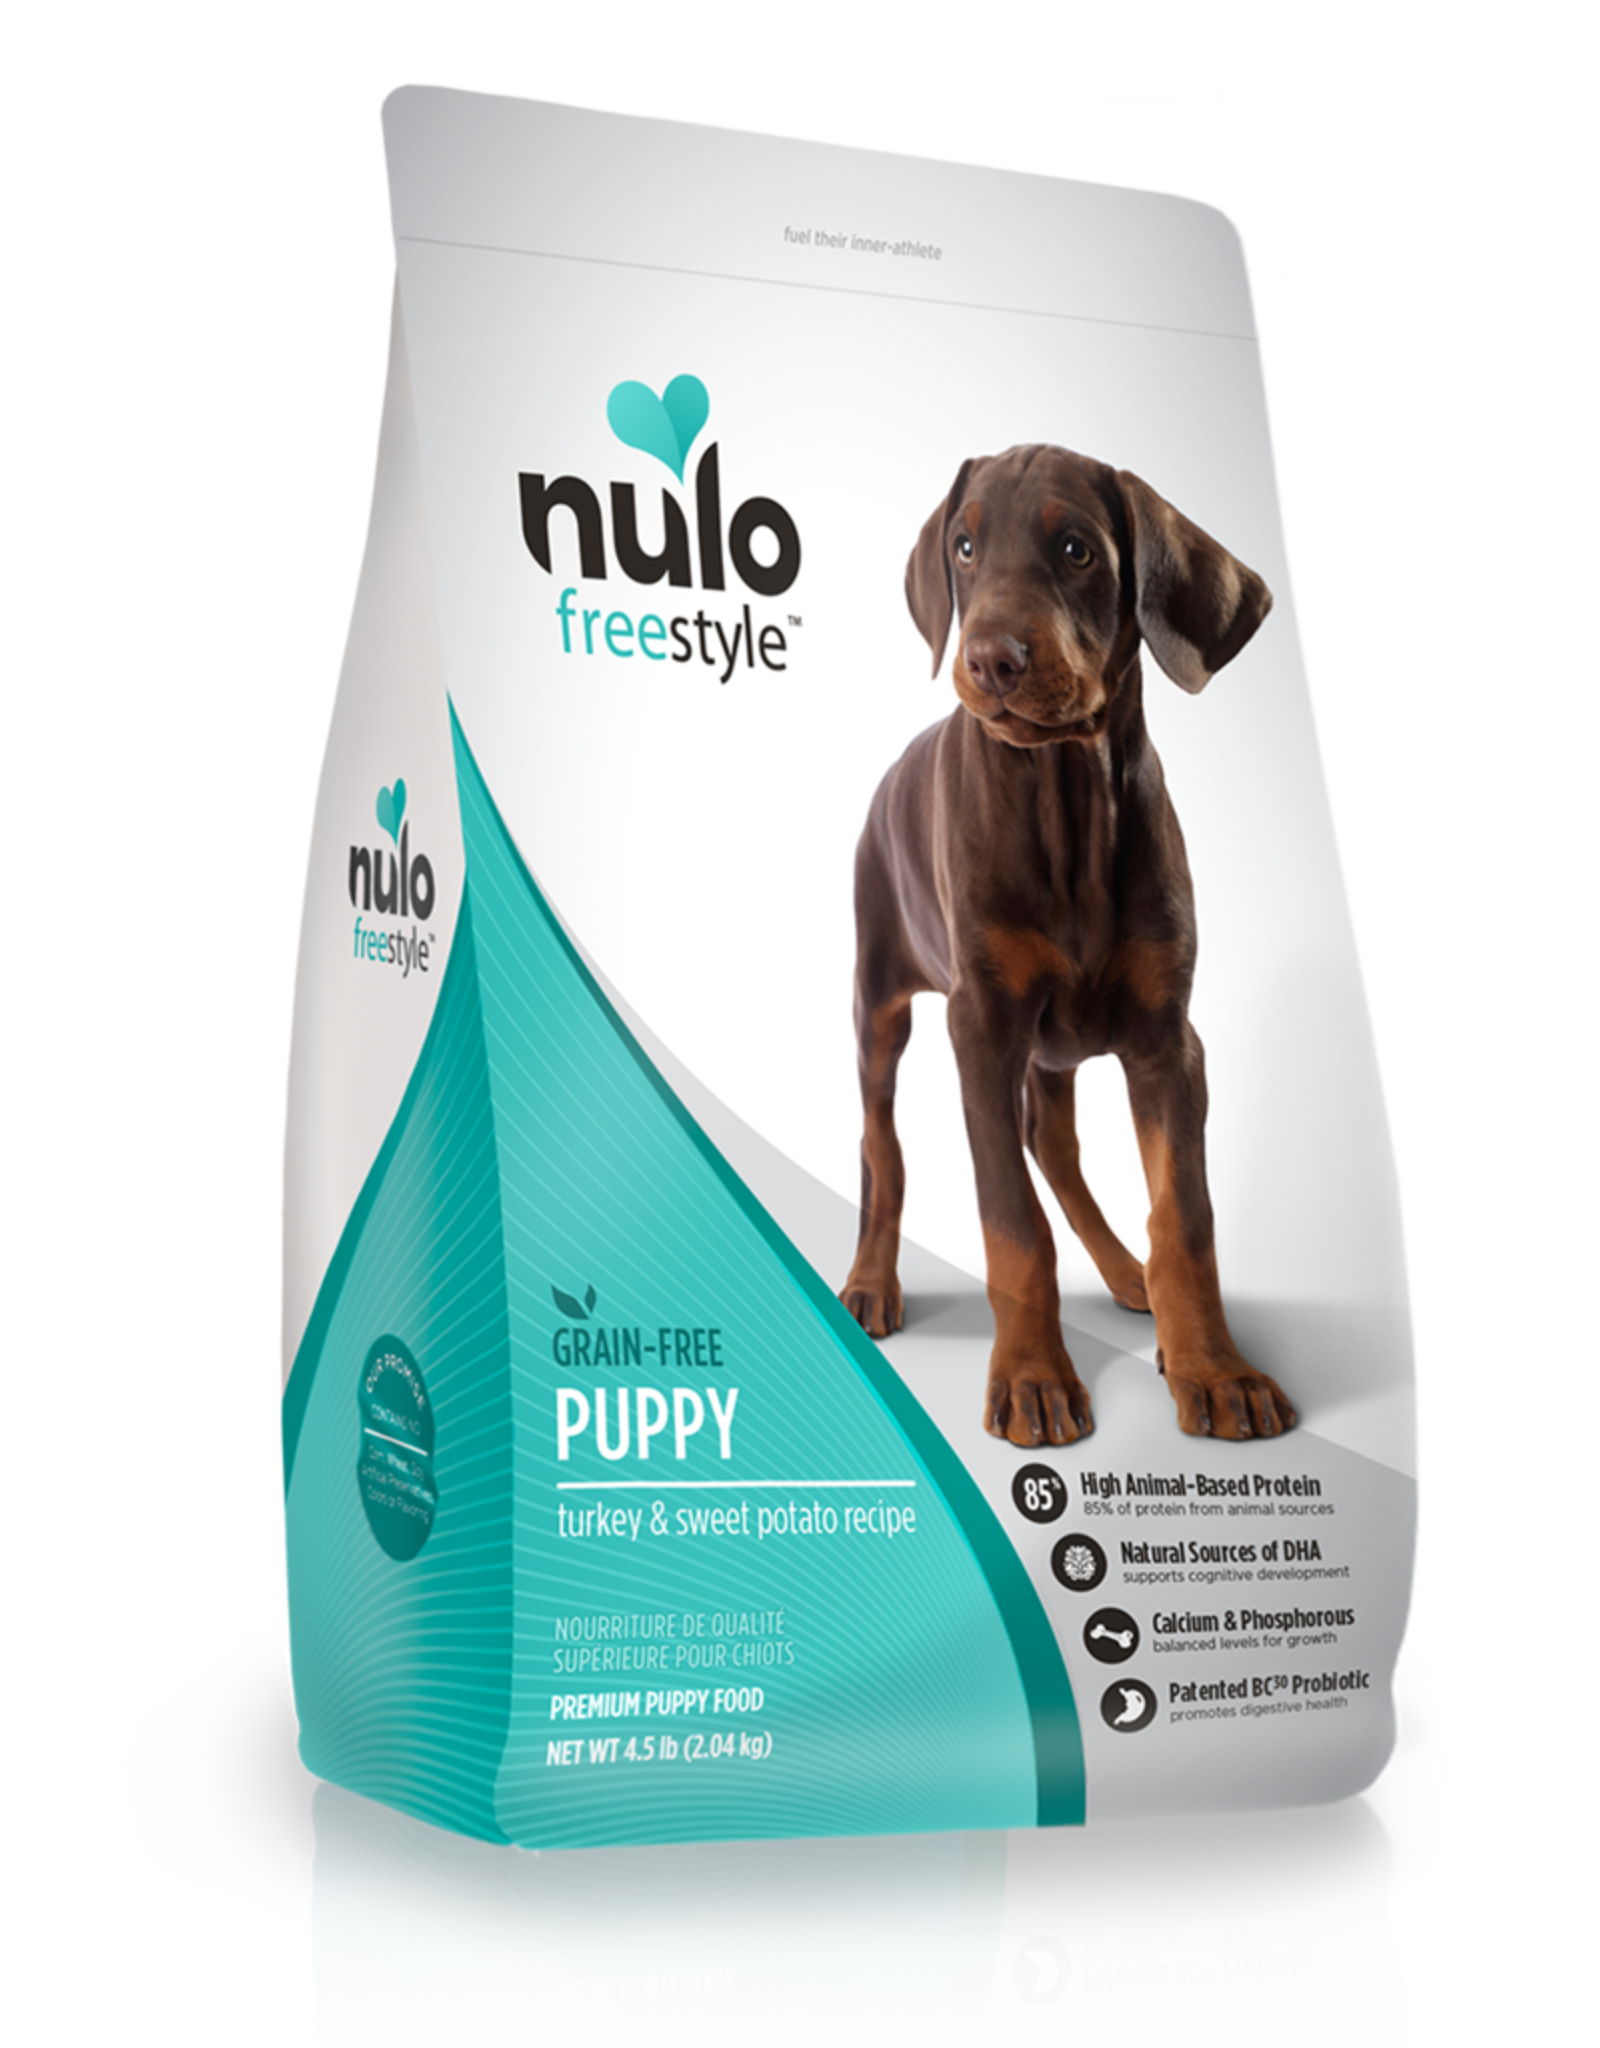 Nulo Dog Freestyle Turkey & Sweet Potato Puppy - Grain-Free 24lb